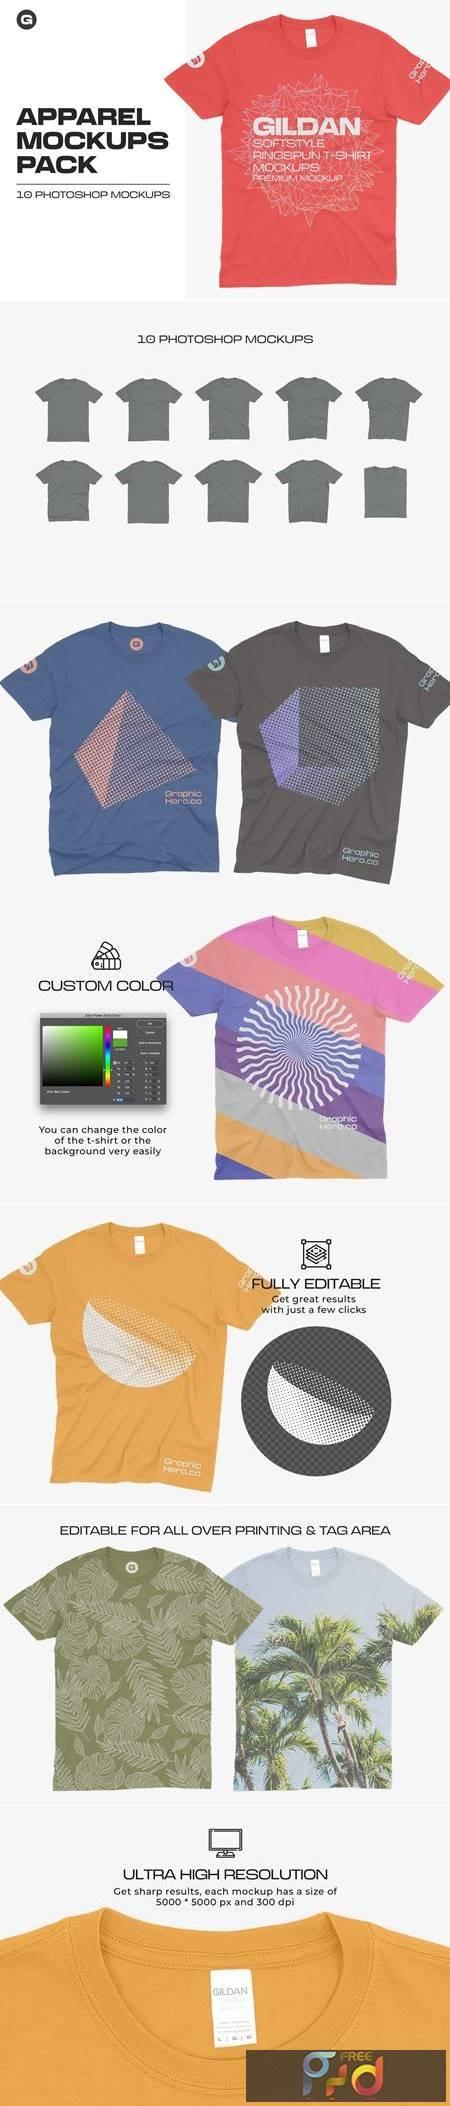 Gildan 64000 T-Shirts Mockups 5685183 1